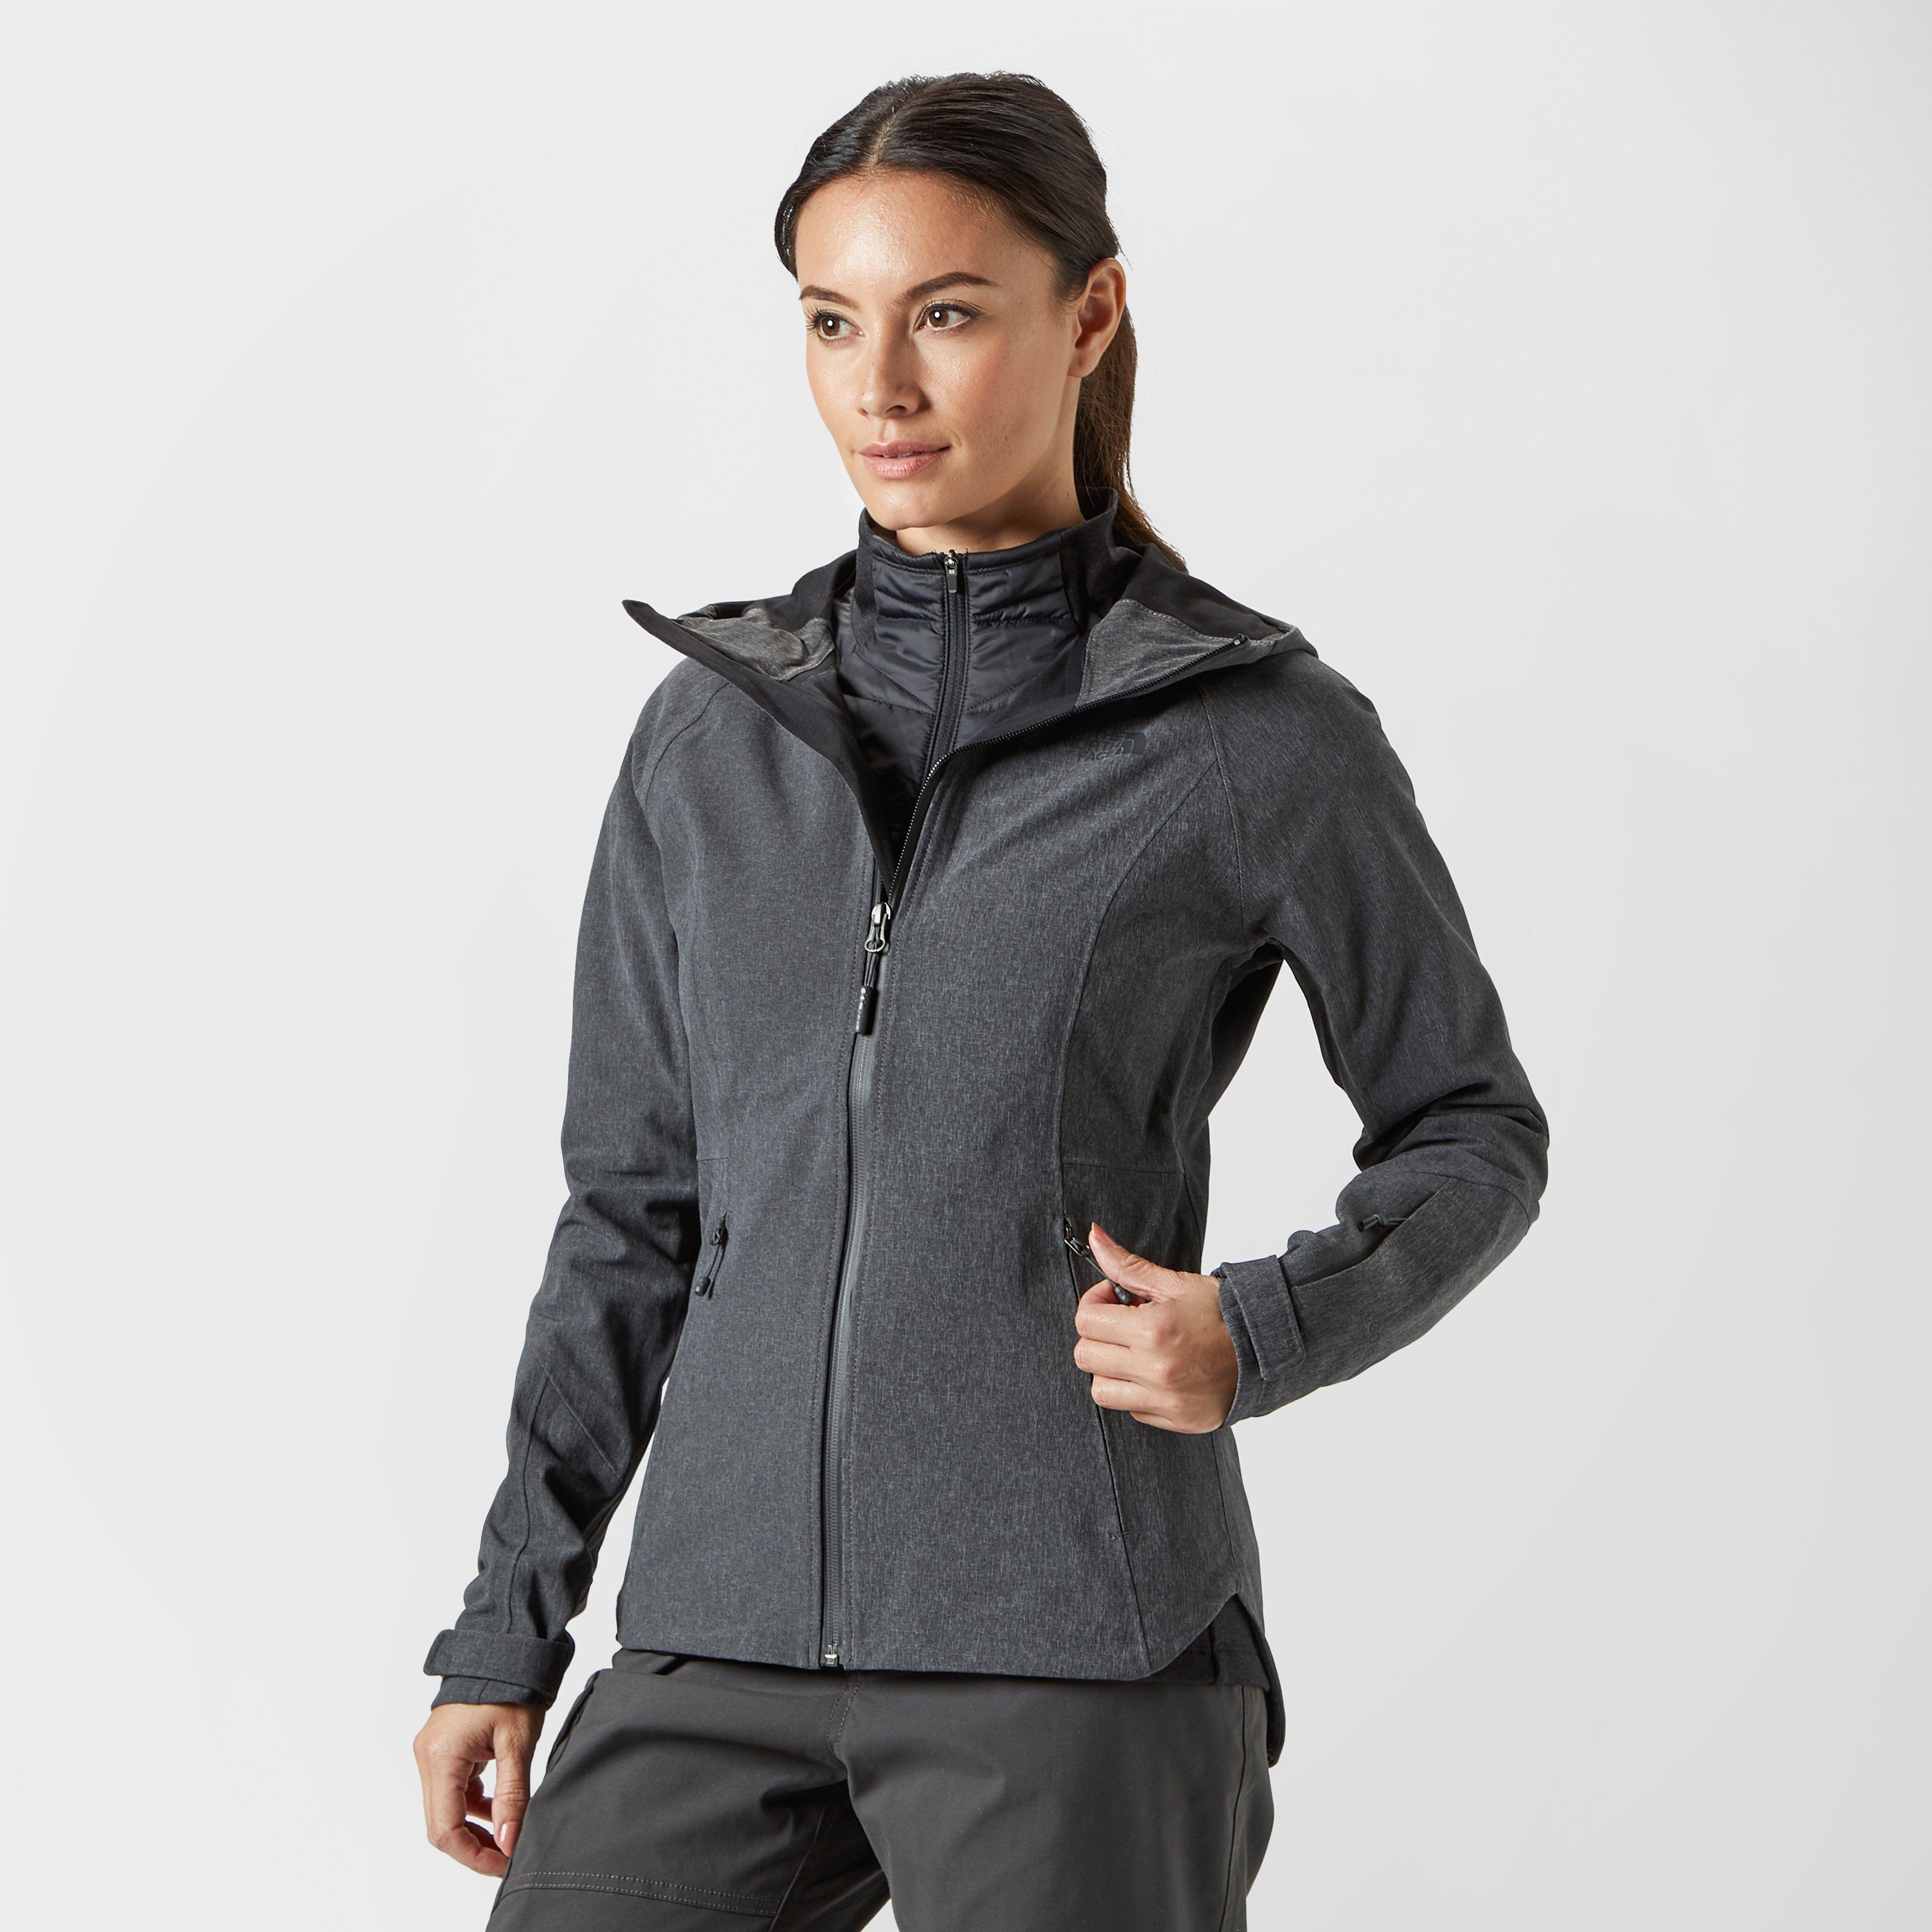 THE NORTH FACE Women's Apex Flex GORE-TEX® Softshell Jacket